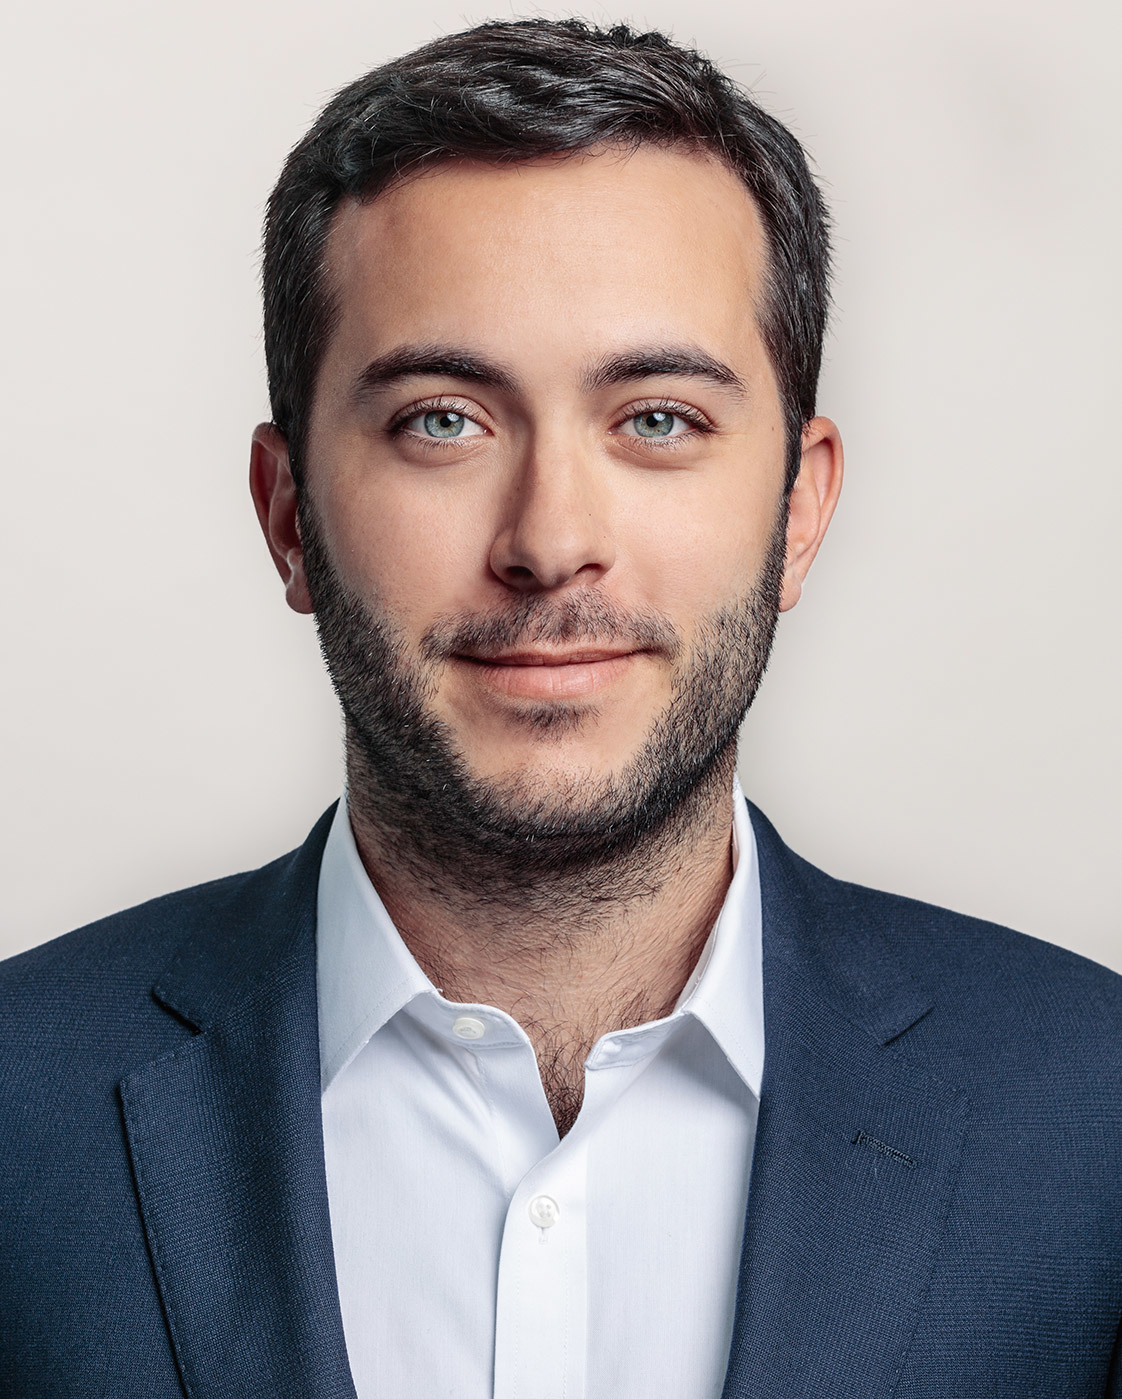 Guglielmo Balzola